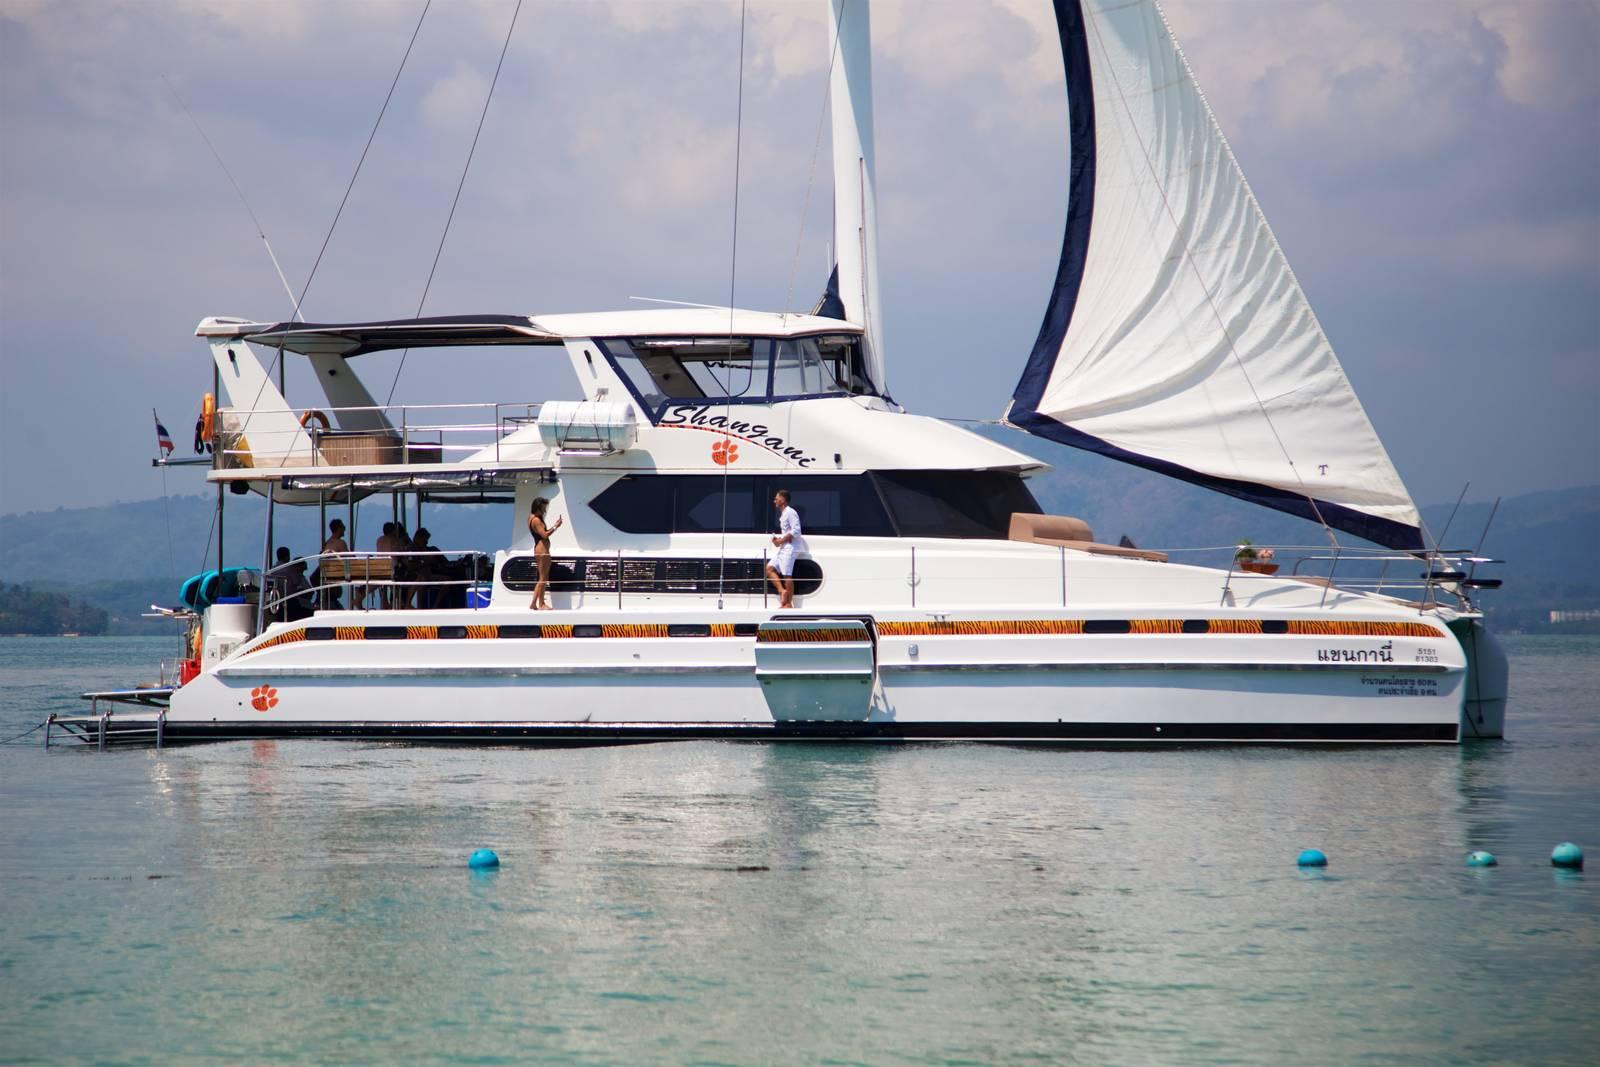 The Big Catamaran - SHANGANI 70 - Tiger Marine Charter